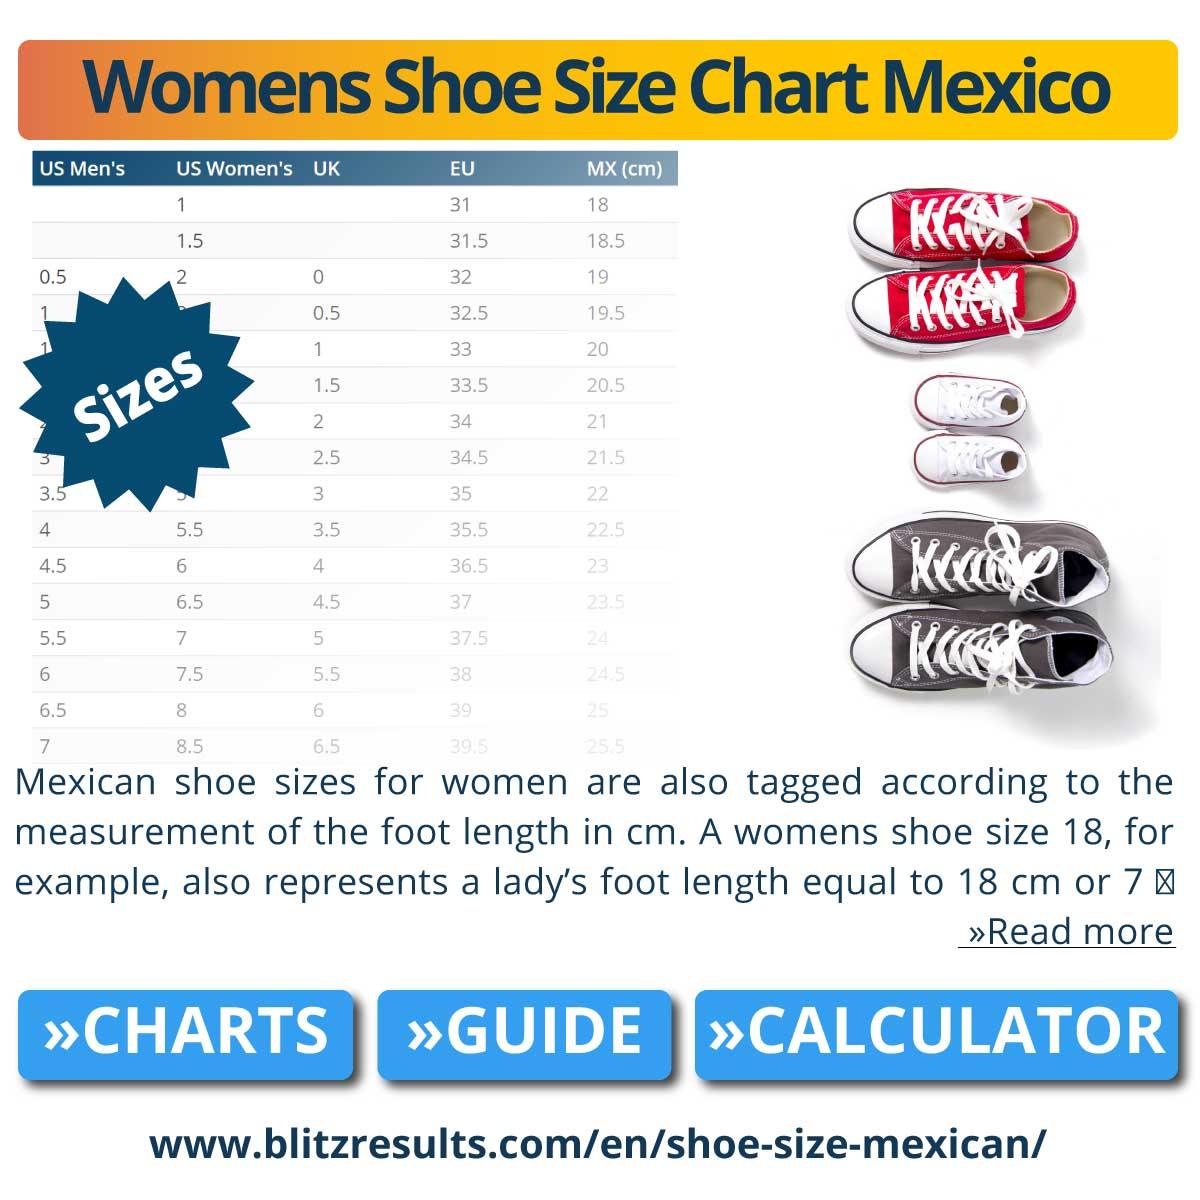 Womens Shoe Size Chart Mexico